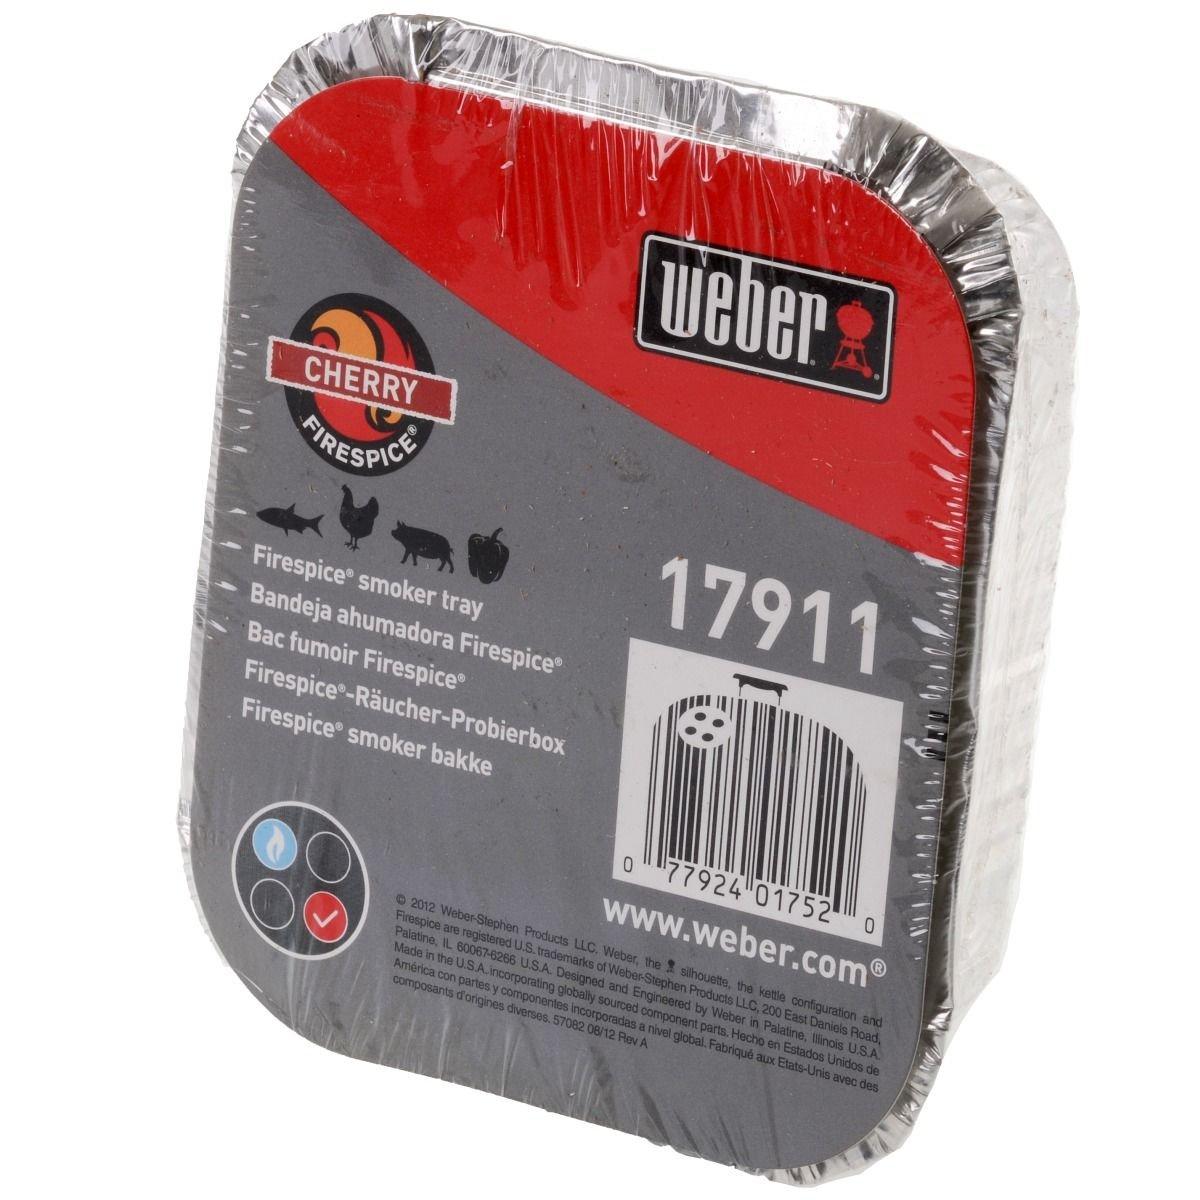 Weber Cubic 17911 Smoke in A Box Cherry